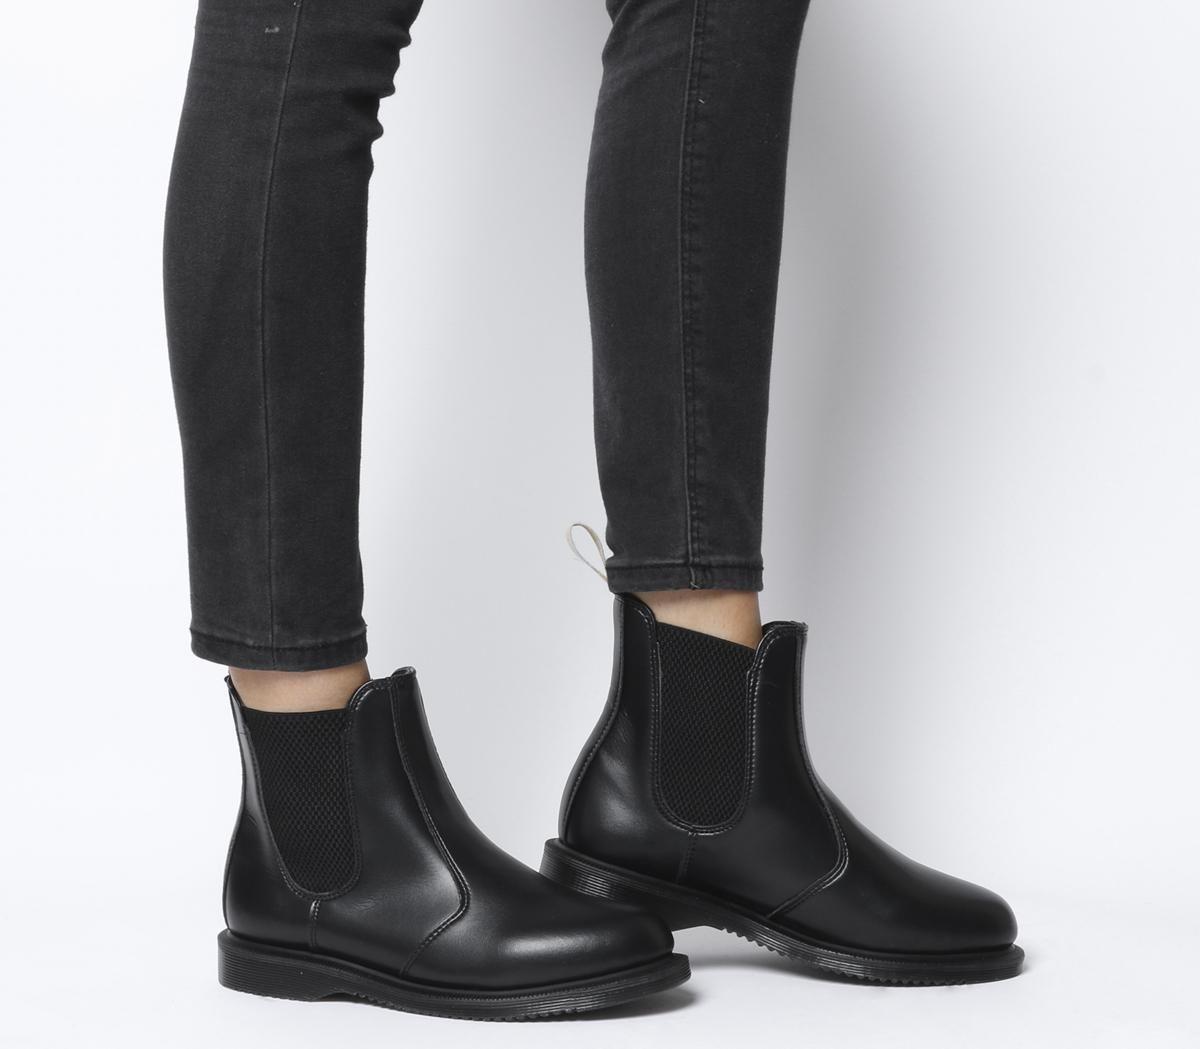 Vegan Chelsea Boots Womens Dr Martens